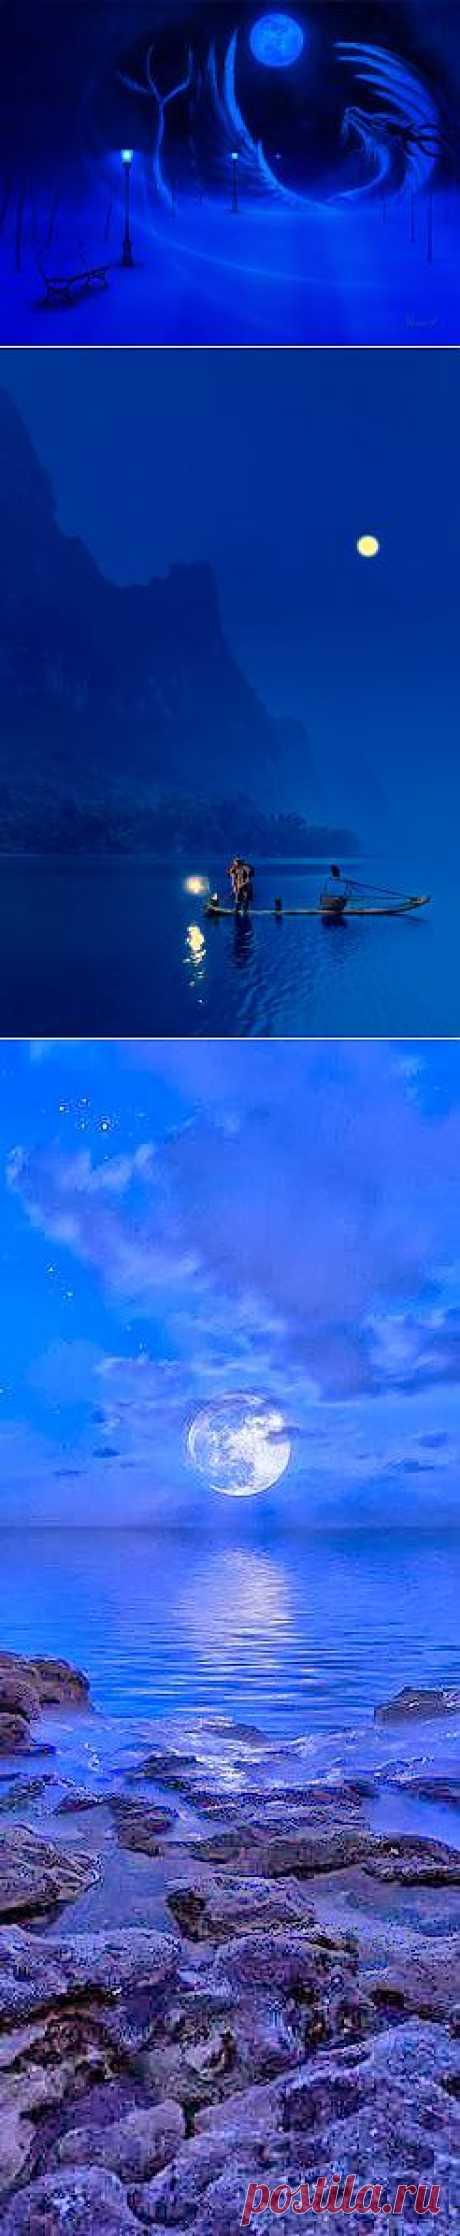 Интересное фото и видео – Ночное фото – Community – Google+